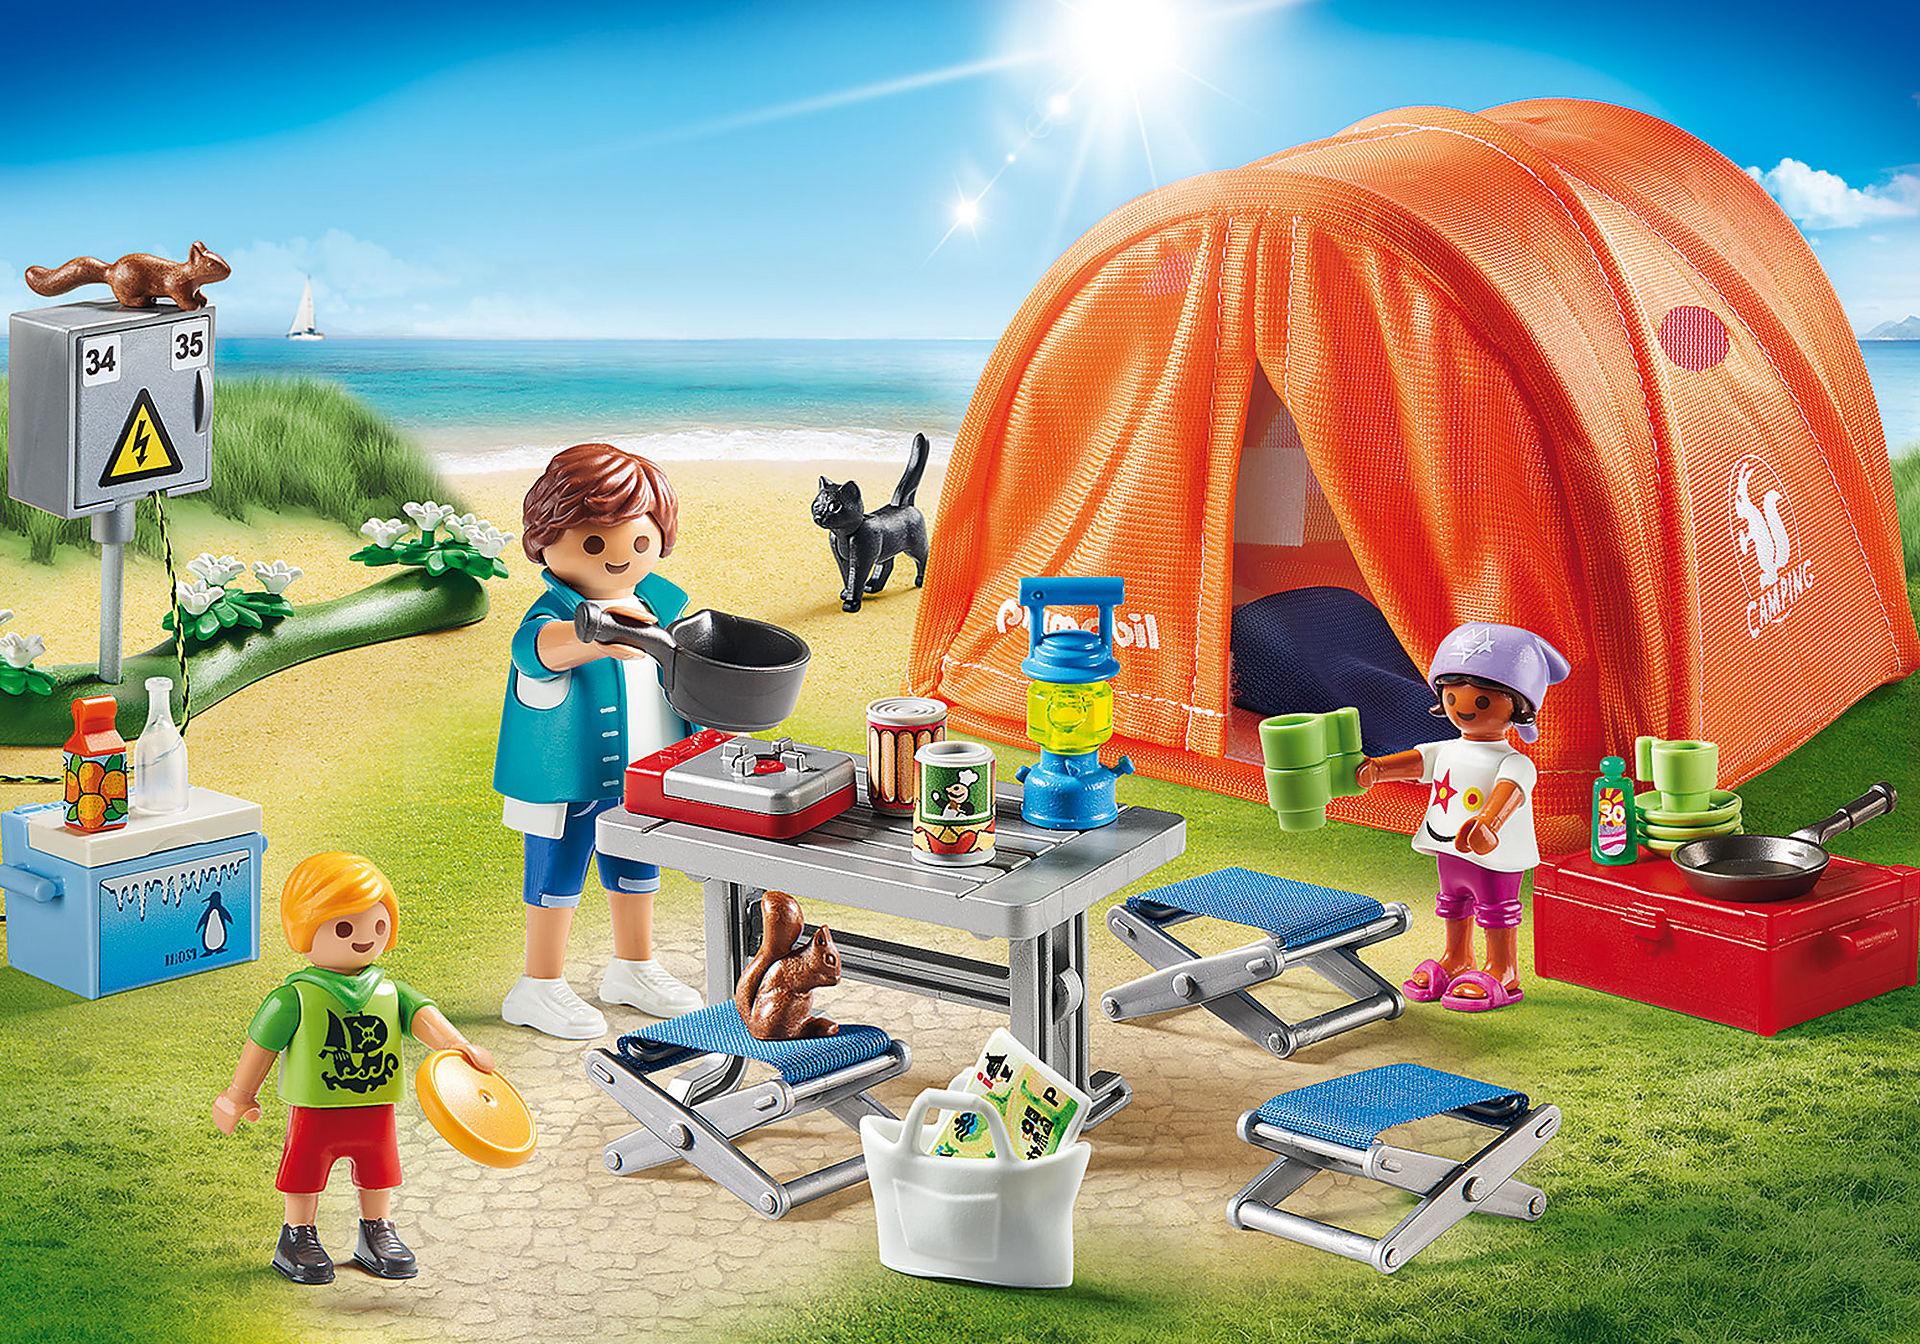 http://media.playmobil.com/i/playmobil/70089_product_detail/Tente et campeurs